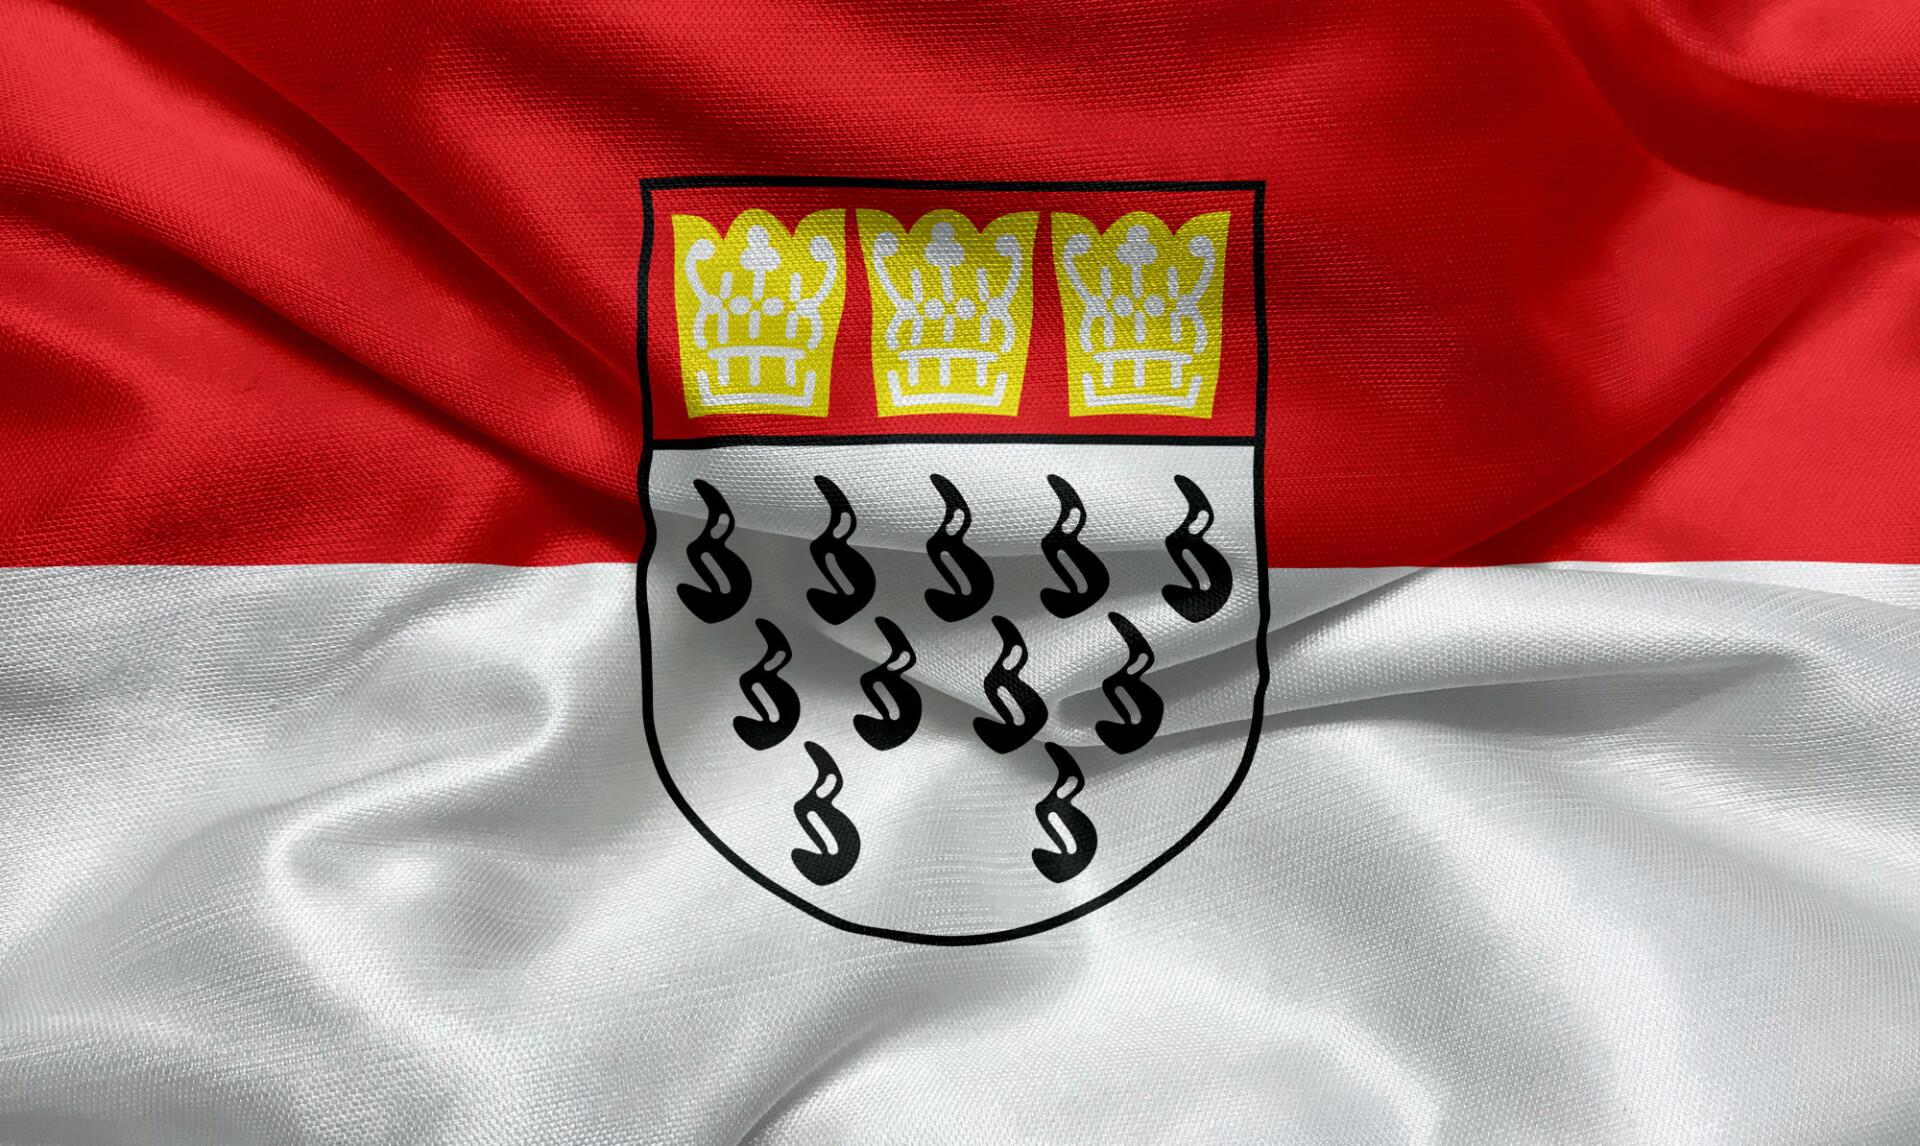 Flag of the city of Köln / Cologne